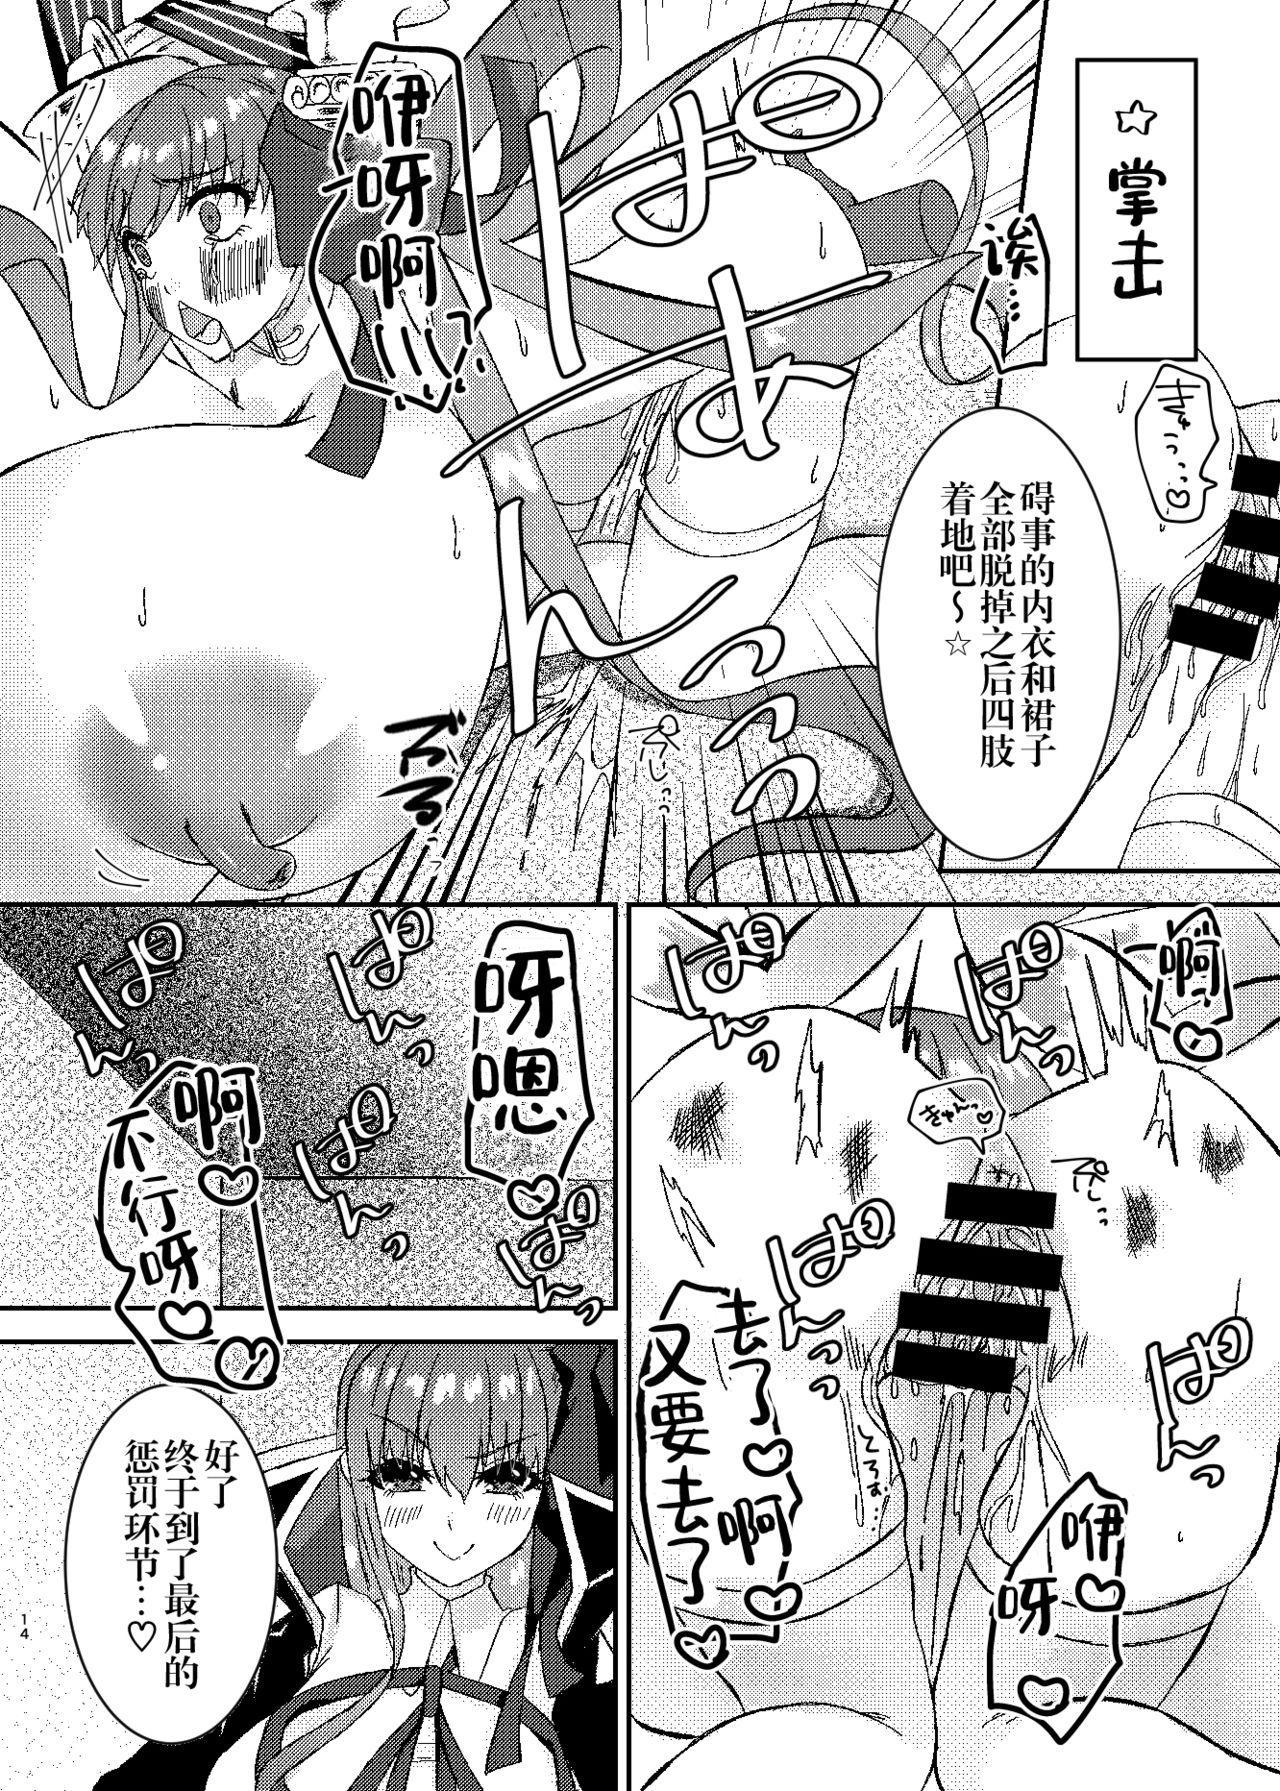 Lip no Oppai ni Oshioki desu | 要对LIP的胸部进行惩罚了 12